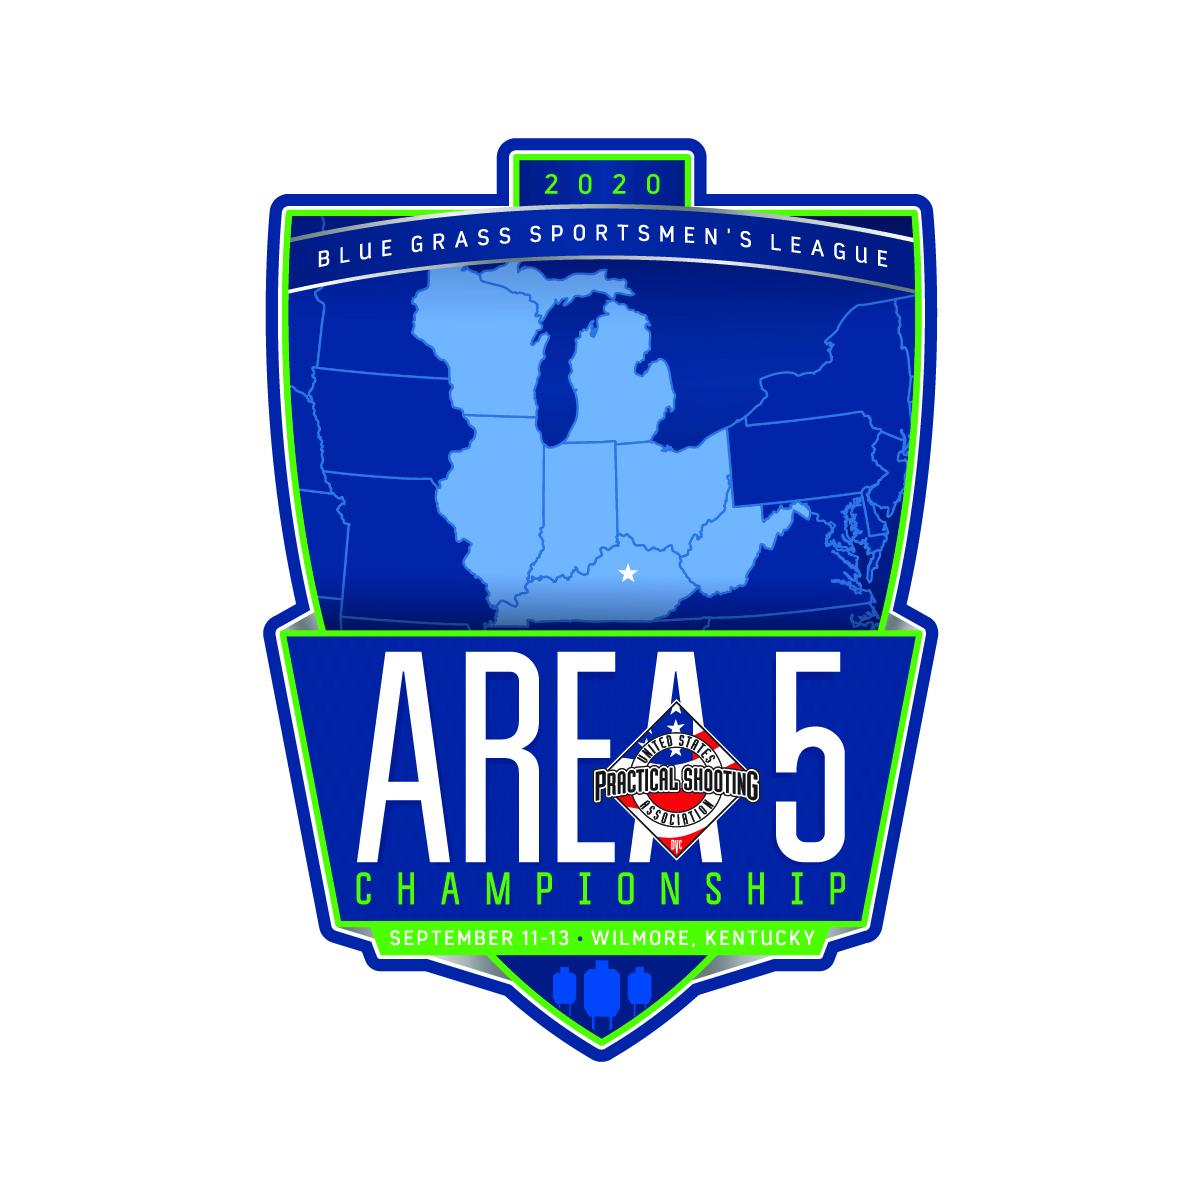 2020 Area 5 Championship